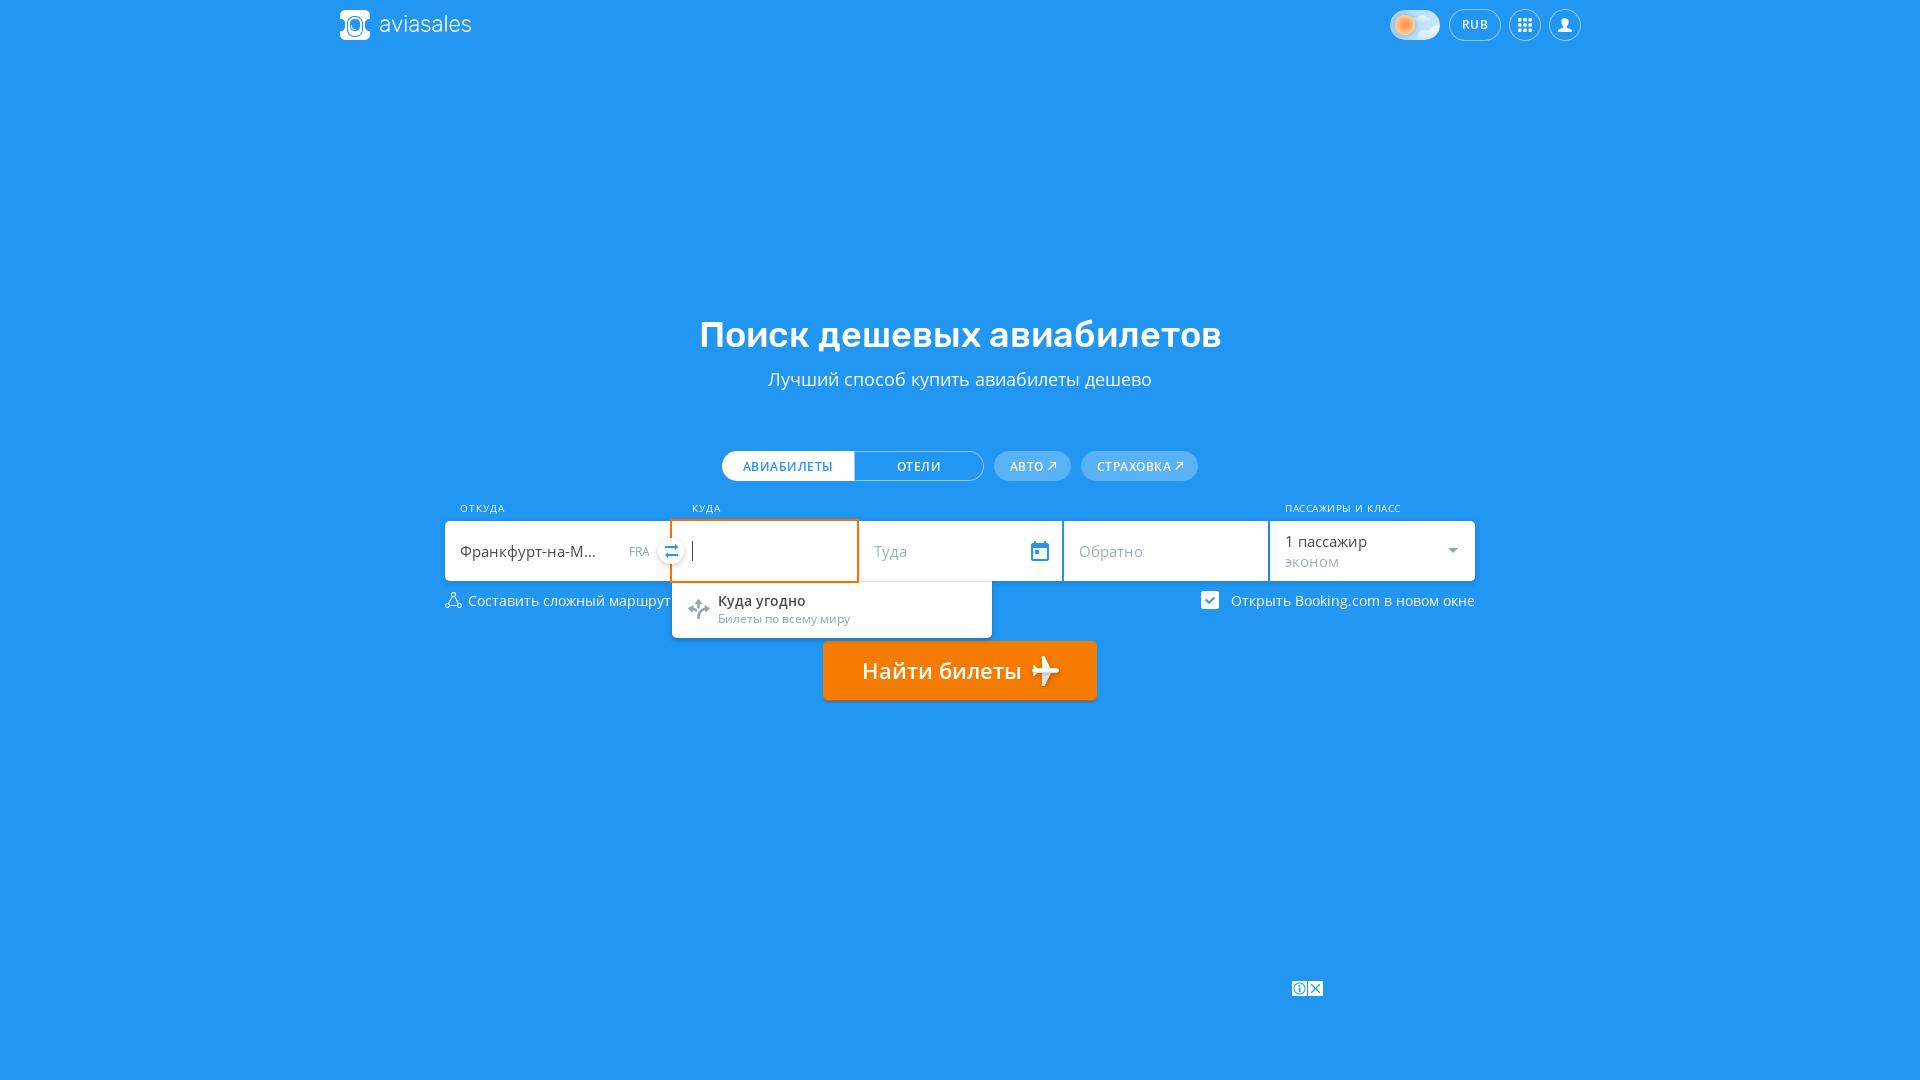 Aviasales.ru website